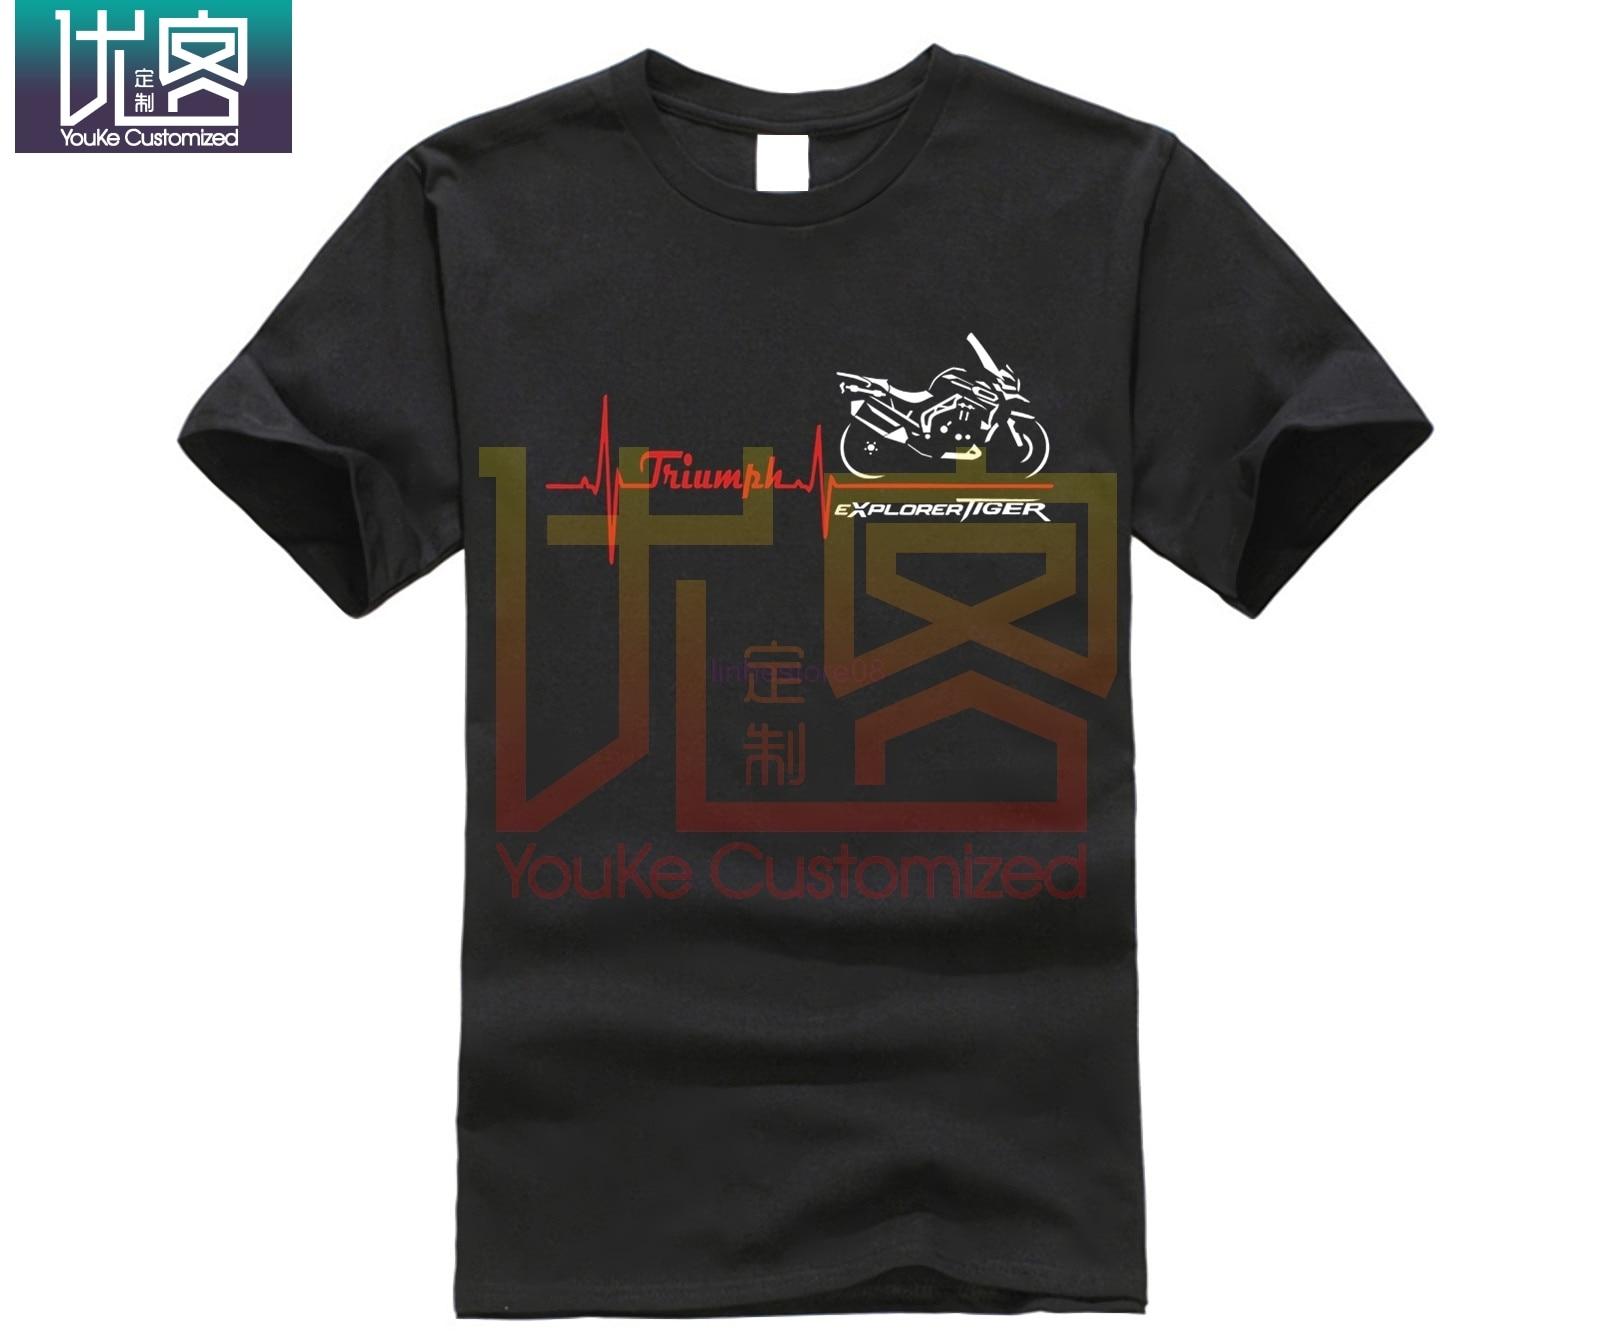 Maglia Per Moto Triumph Tiger Explorer Battito Cuore camiseta de moda para hombres camiseta Tops